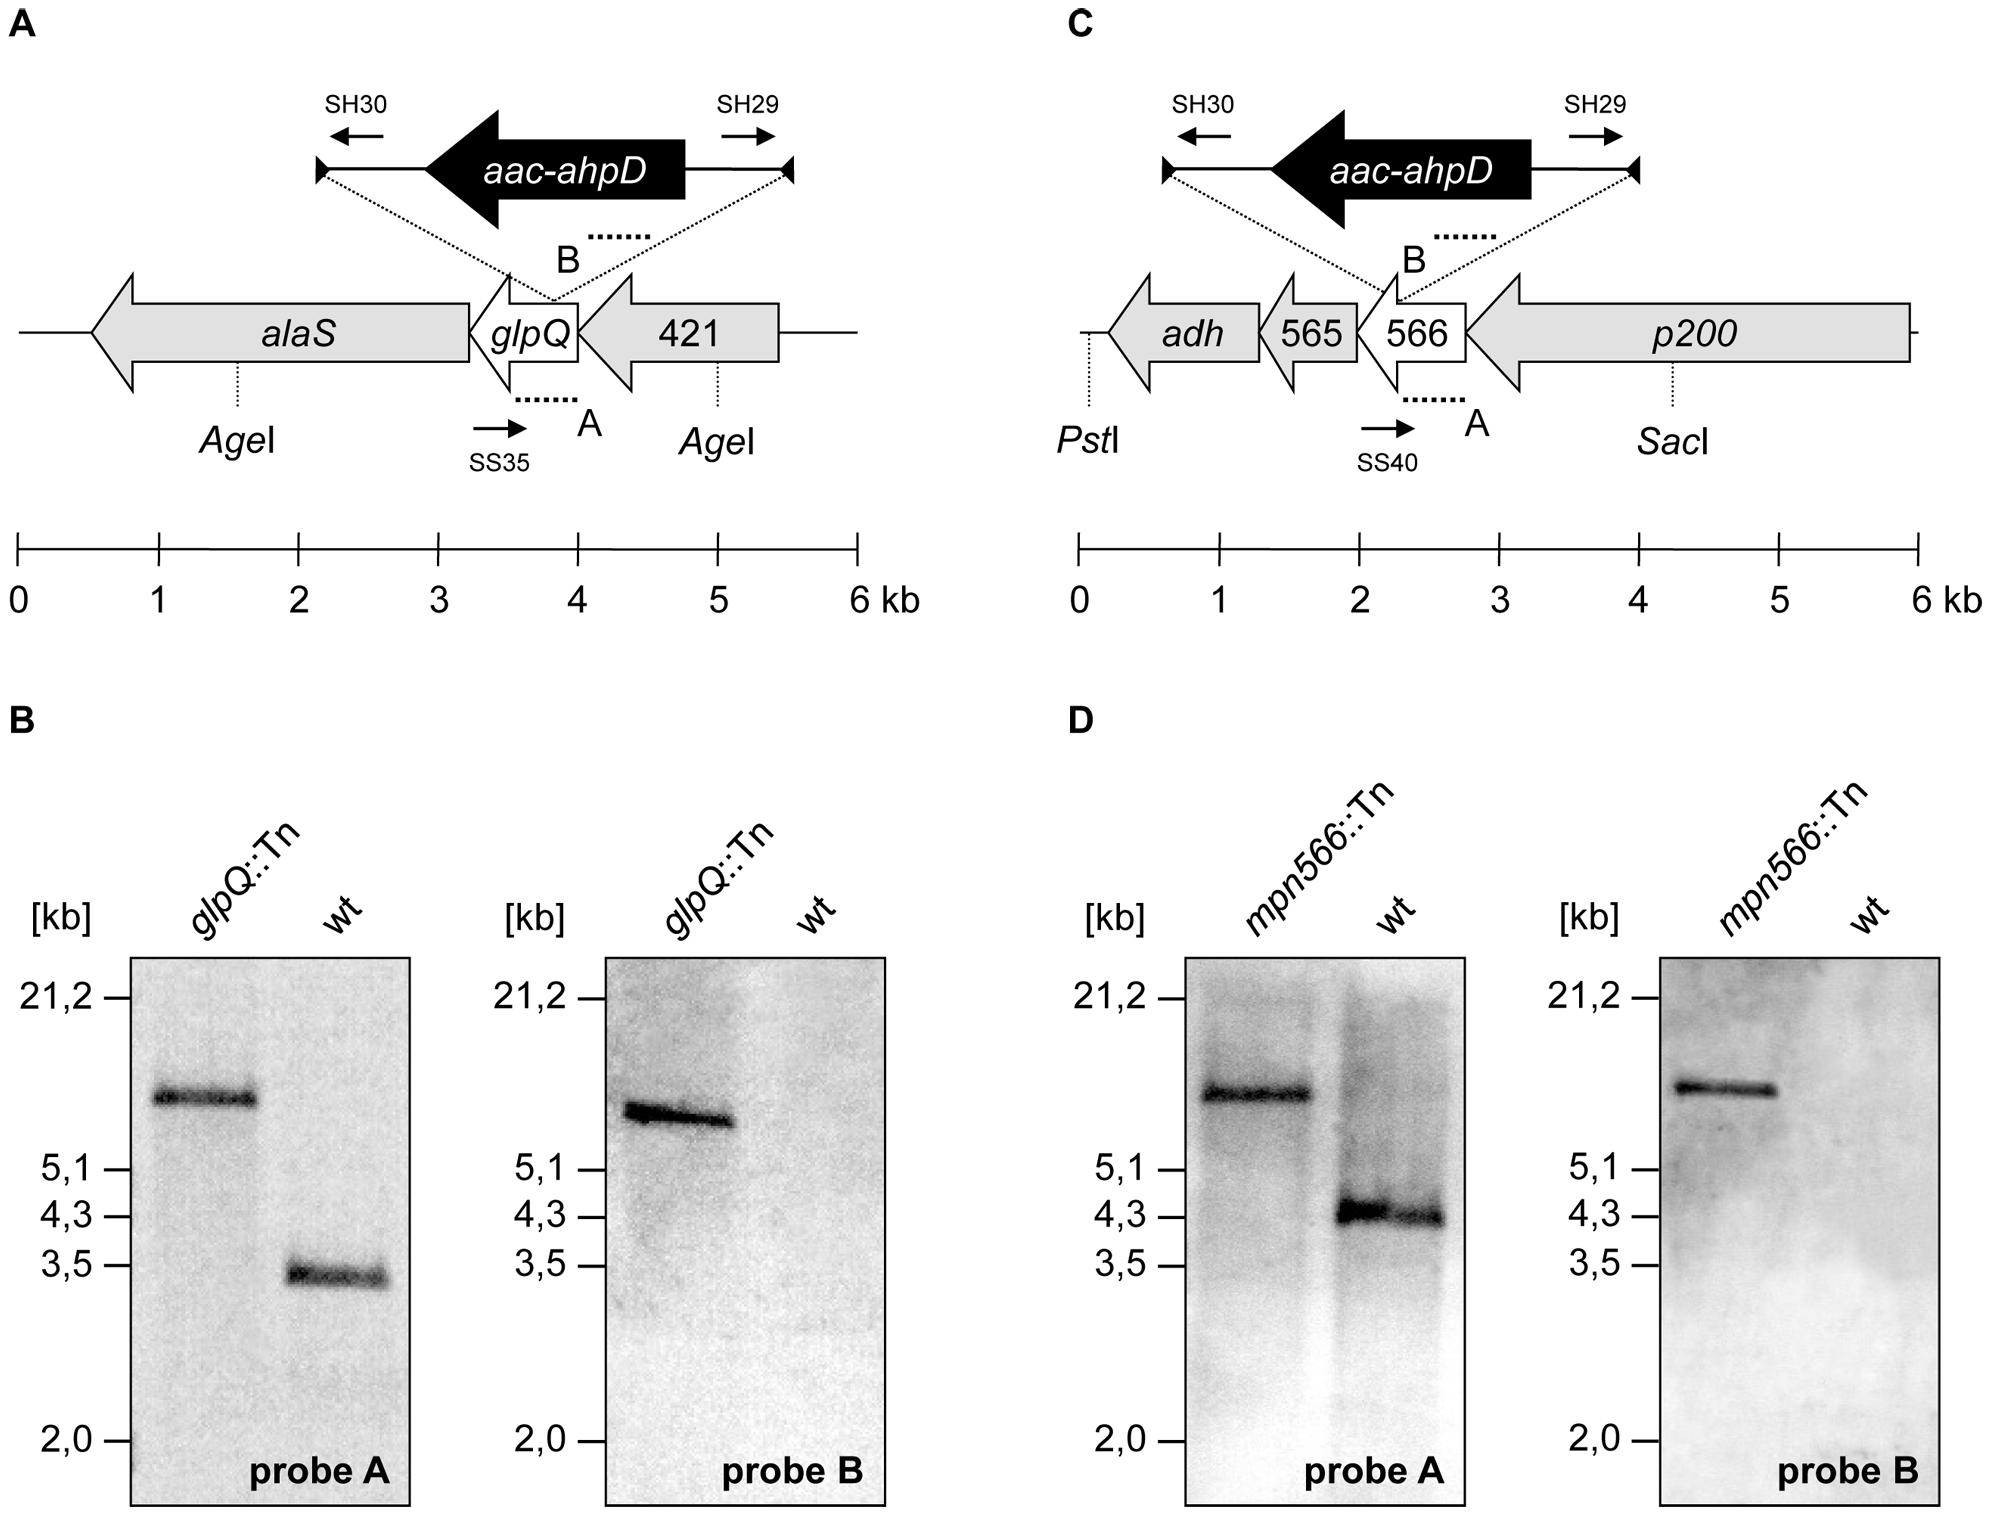 Isolation of <i>M. pneumoniae</i> glycerophosphodiesterases transposon insertion mutants.